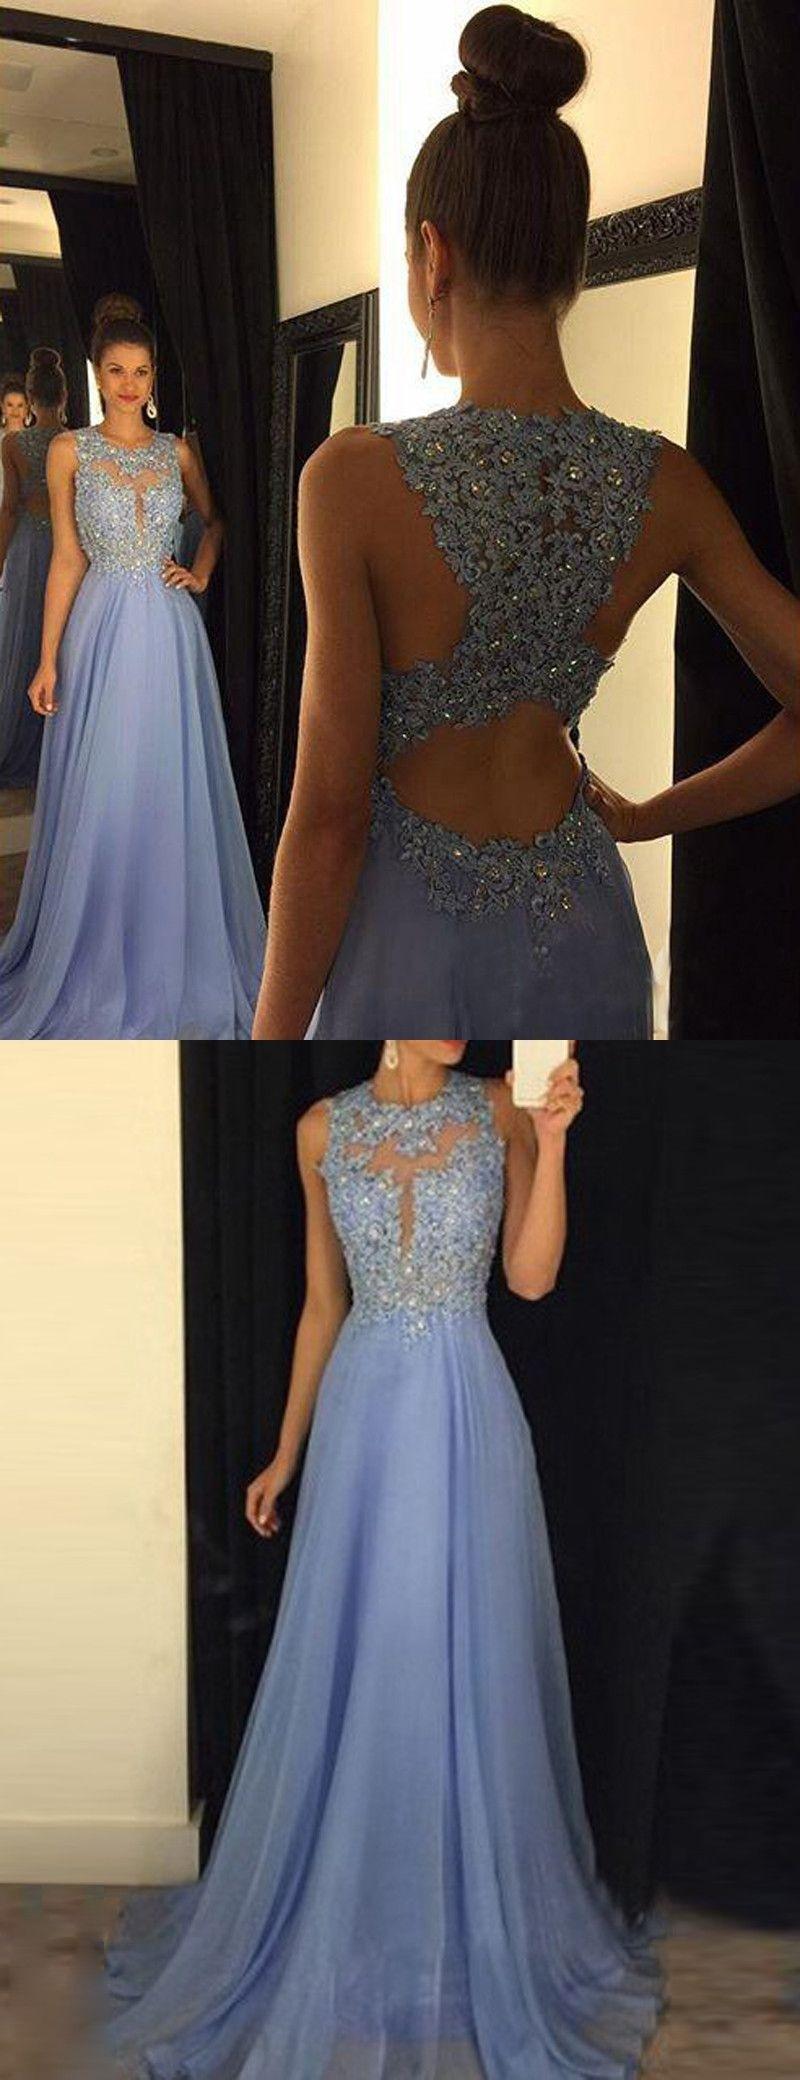 20 Top Abendkleider Elegant Spezialgebiet - Abendkleid